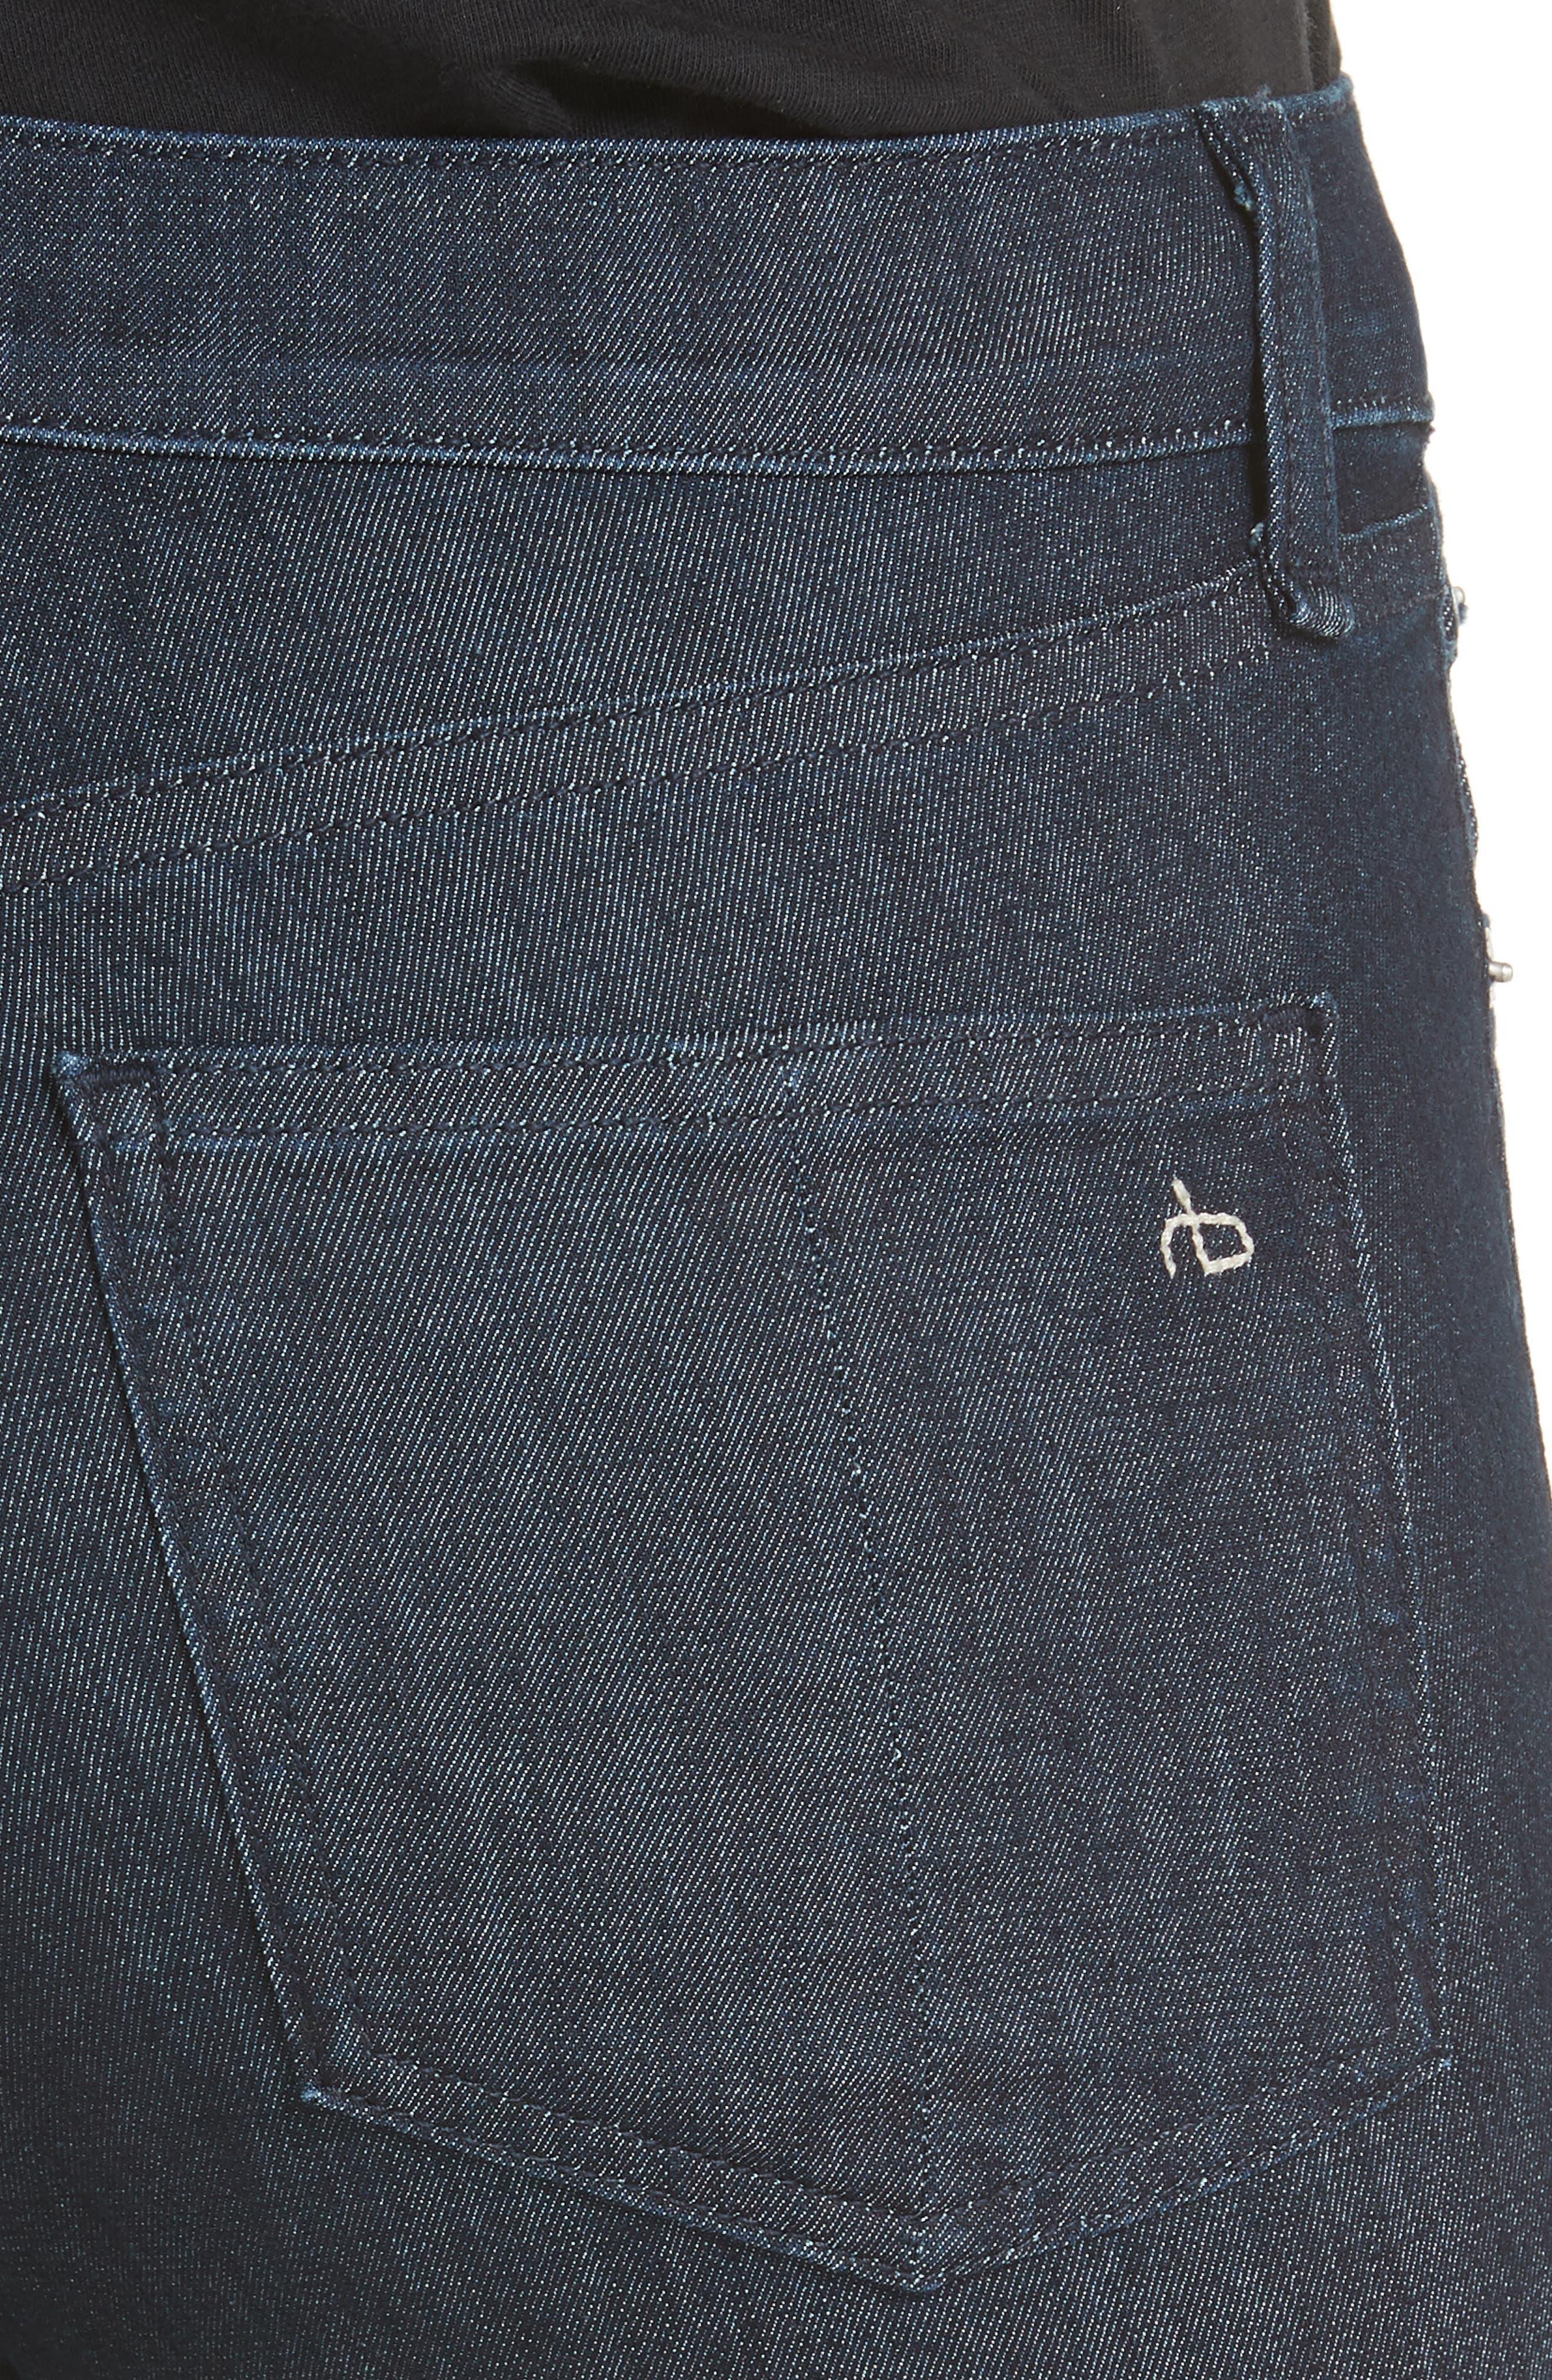 RAG & BONE, High Waist Skinny Jeans, Alternate thumbnail 5, color, INDIGO